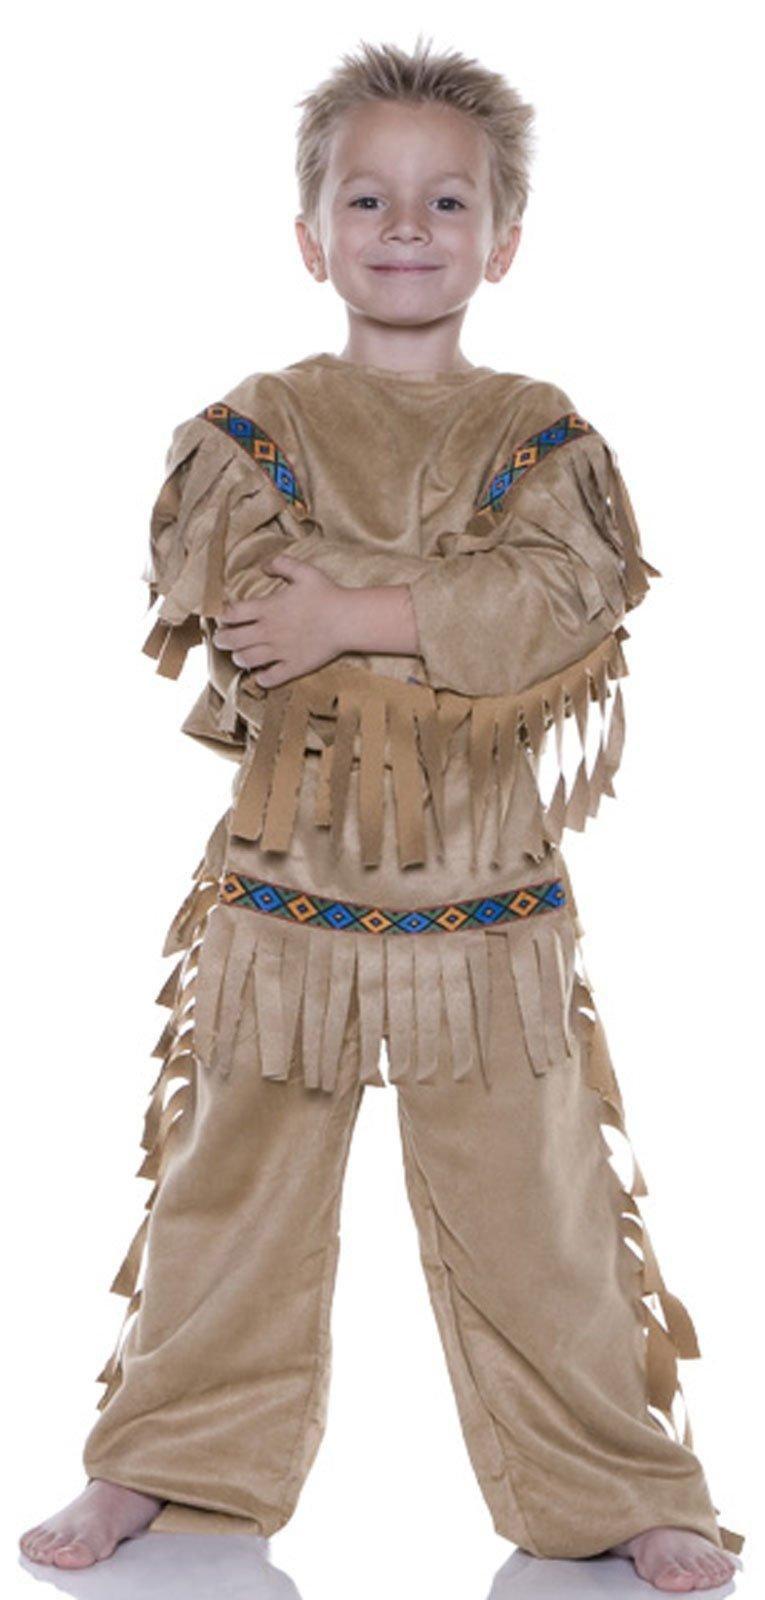 Indian Boy Costume From Buycostumescom  Boy Costumes -7712